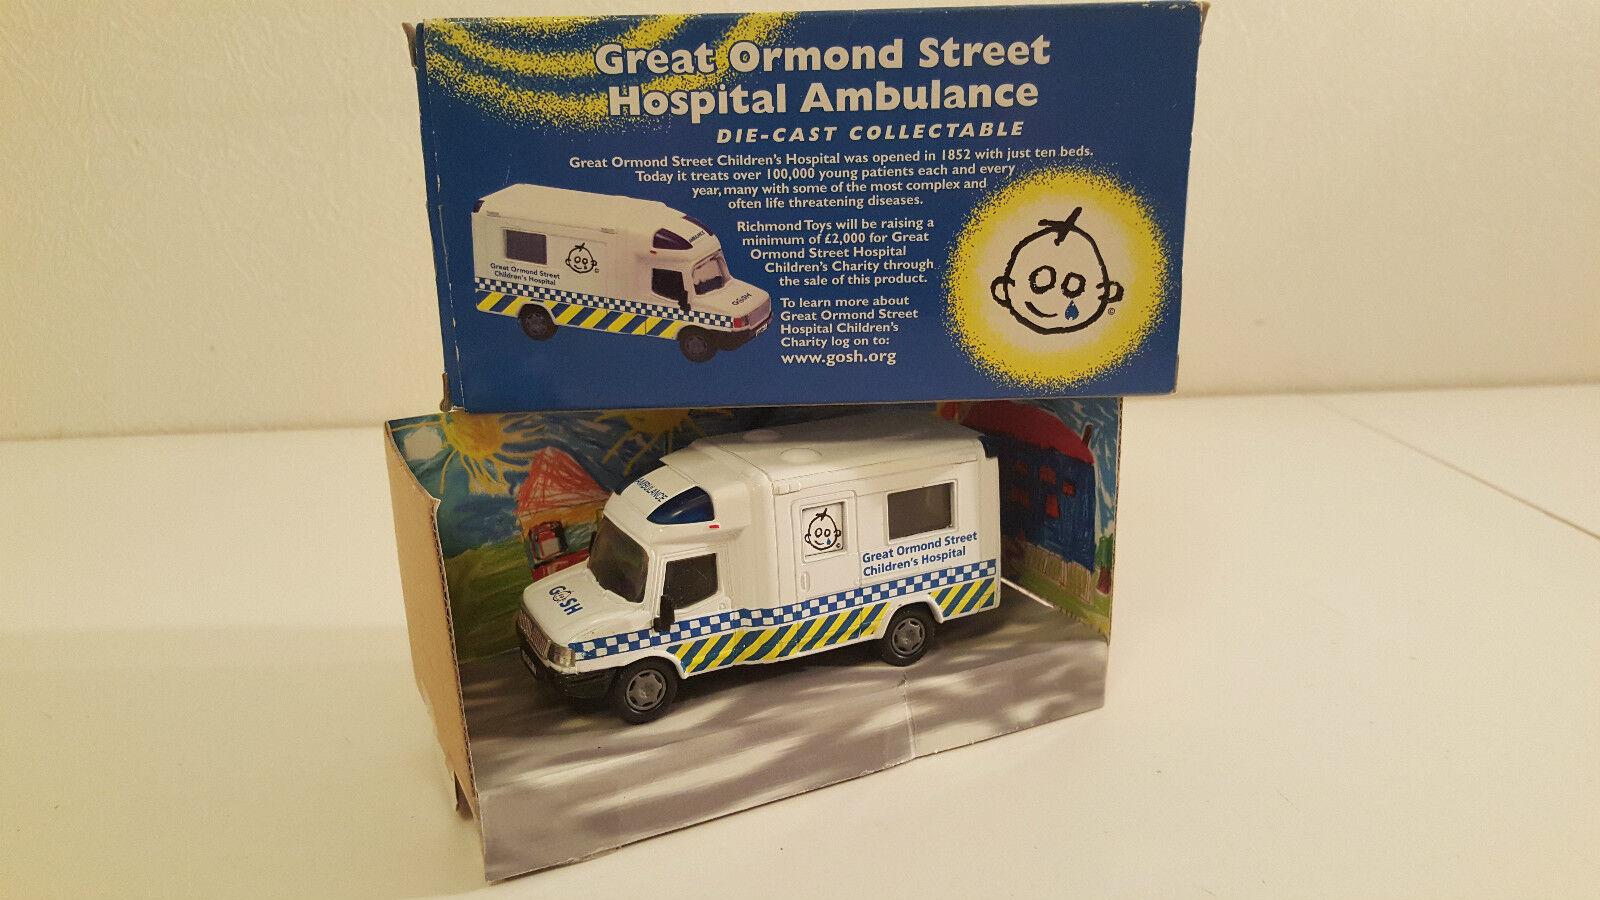 Richmond Toys Toys Toys - GOSH Ambulance (Great Ormond Street Hospital) Série limitée 1 43 a427ad